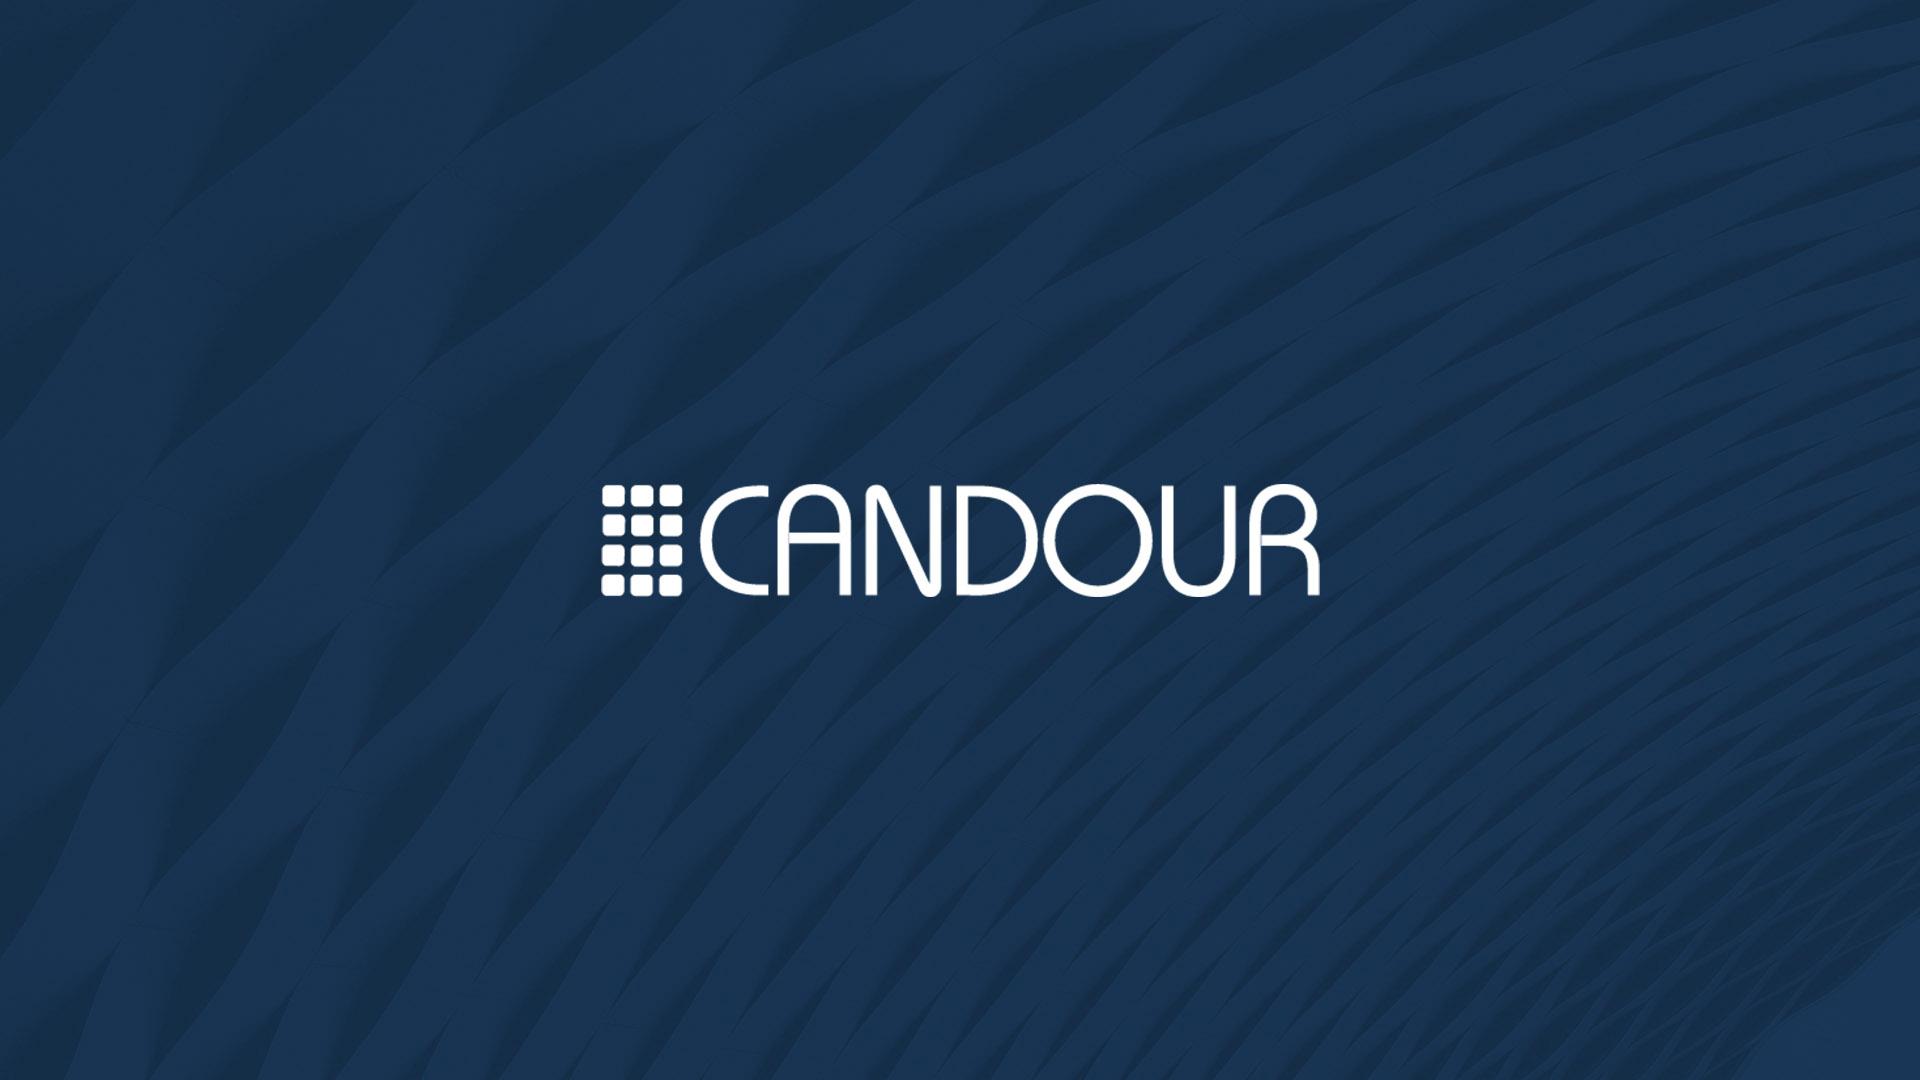 Candour 01